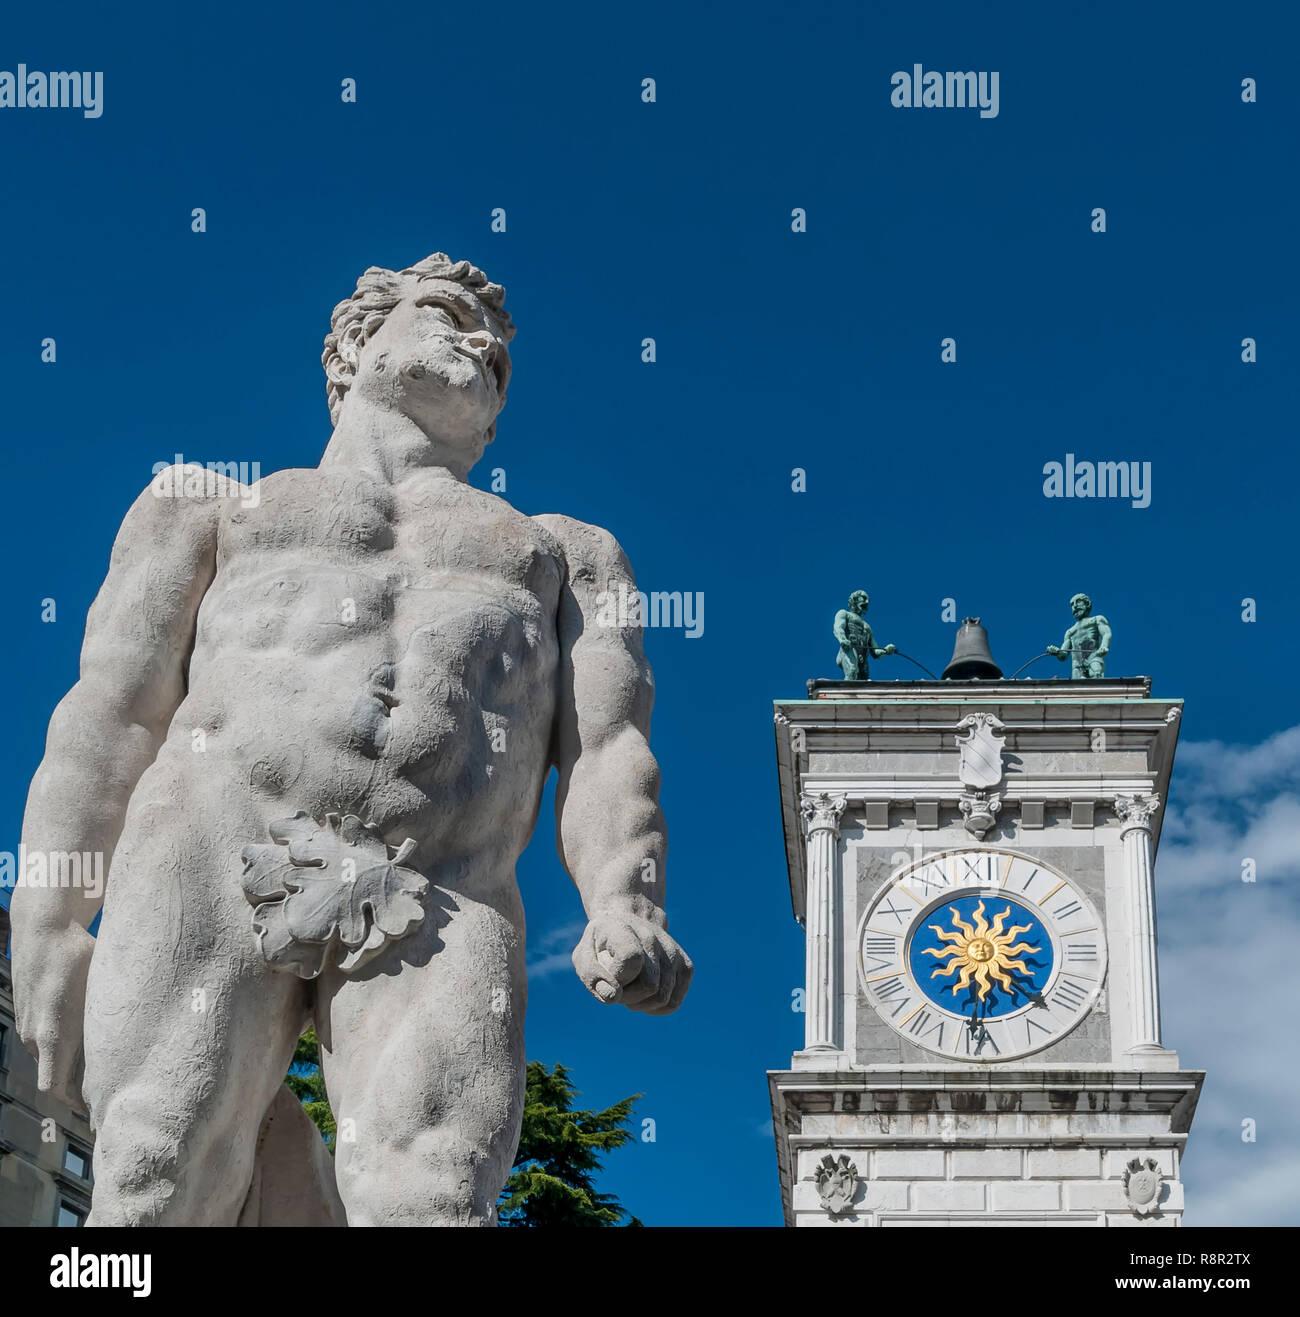 The statue of Hercules with the clock tower of the San Giovanni colonnade, Piazza della Libertà, Udine, Friuli, Italy - Stock Image